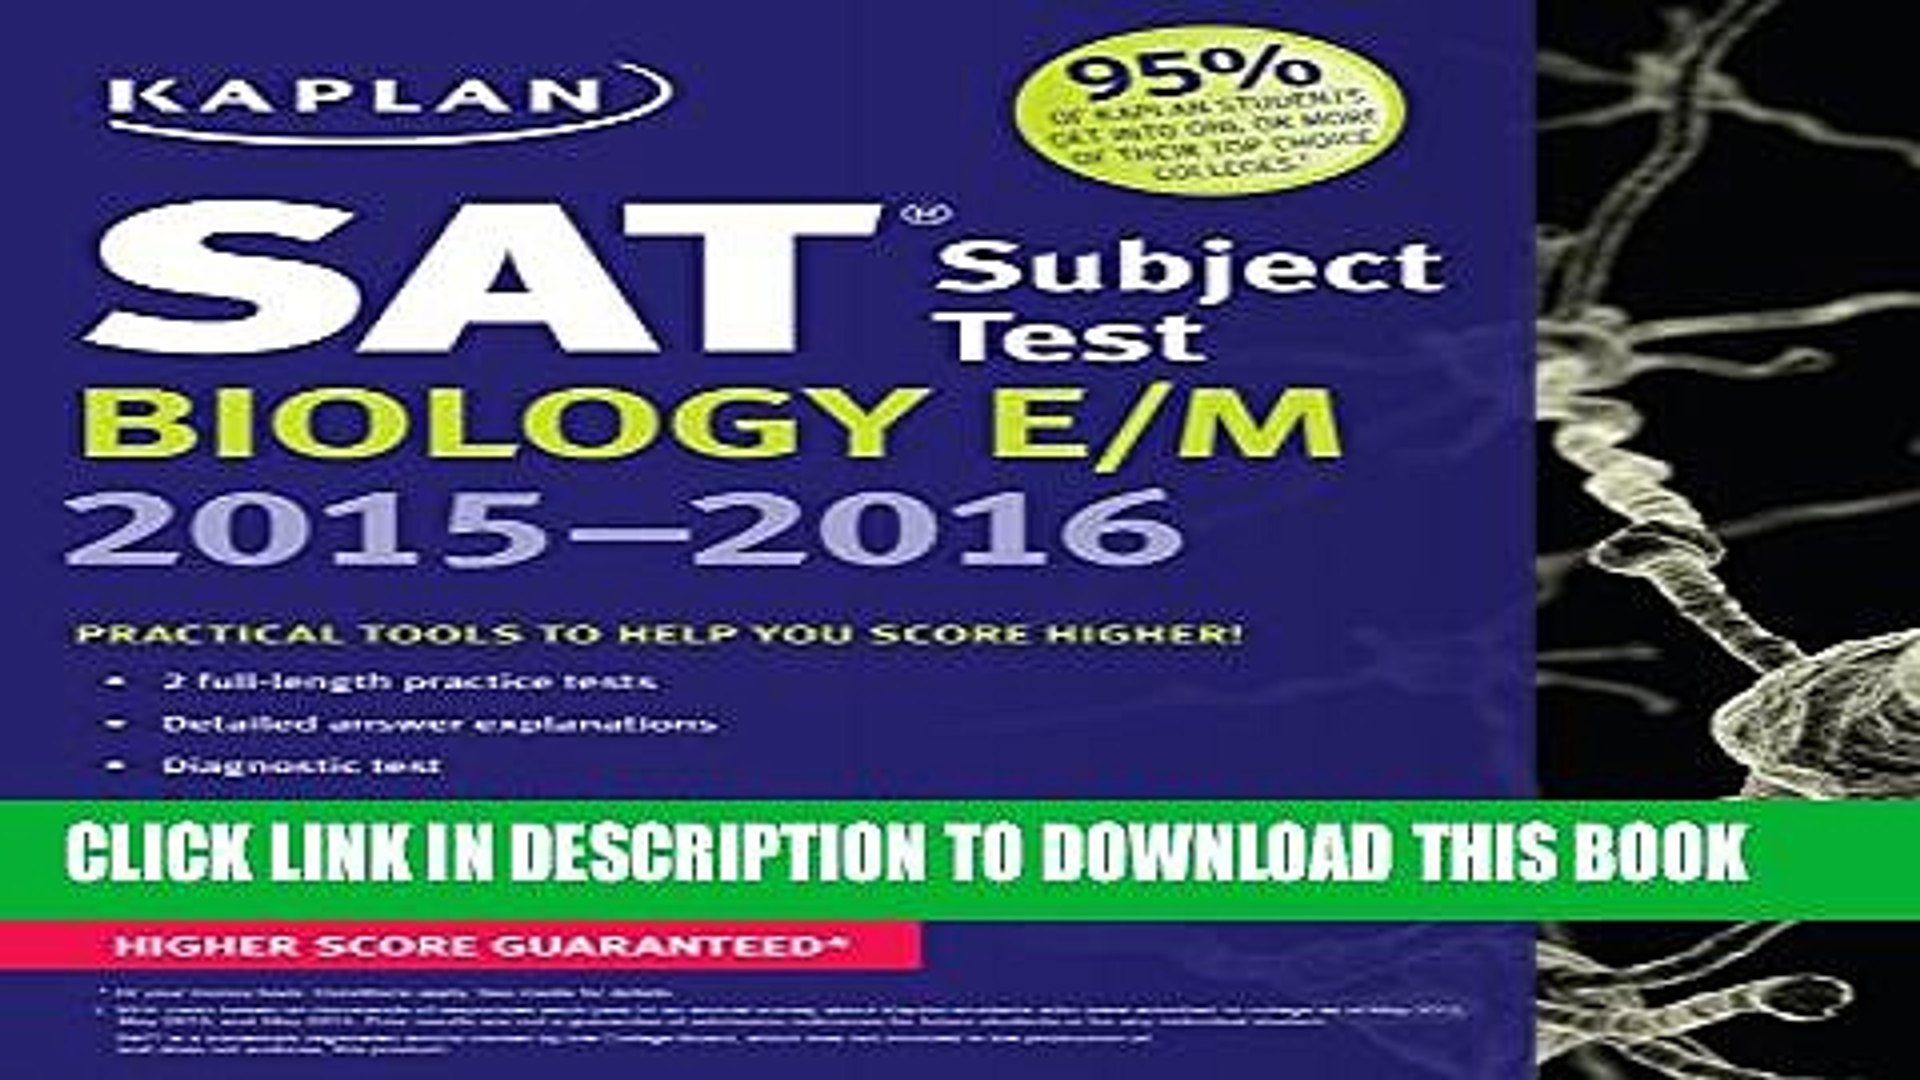 [PDF] Kaplan SAT Subject Test Biology E/M 2015-2016 (Kaplan Test Prep) Full  Online